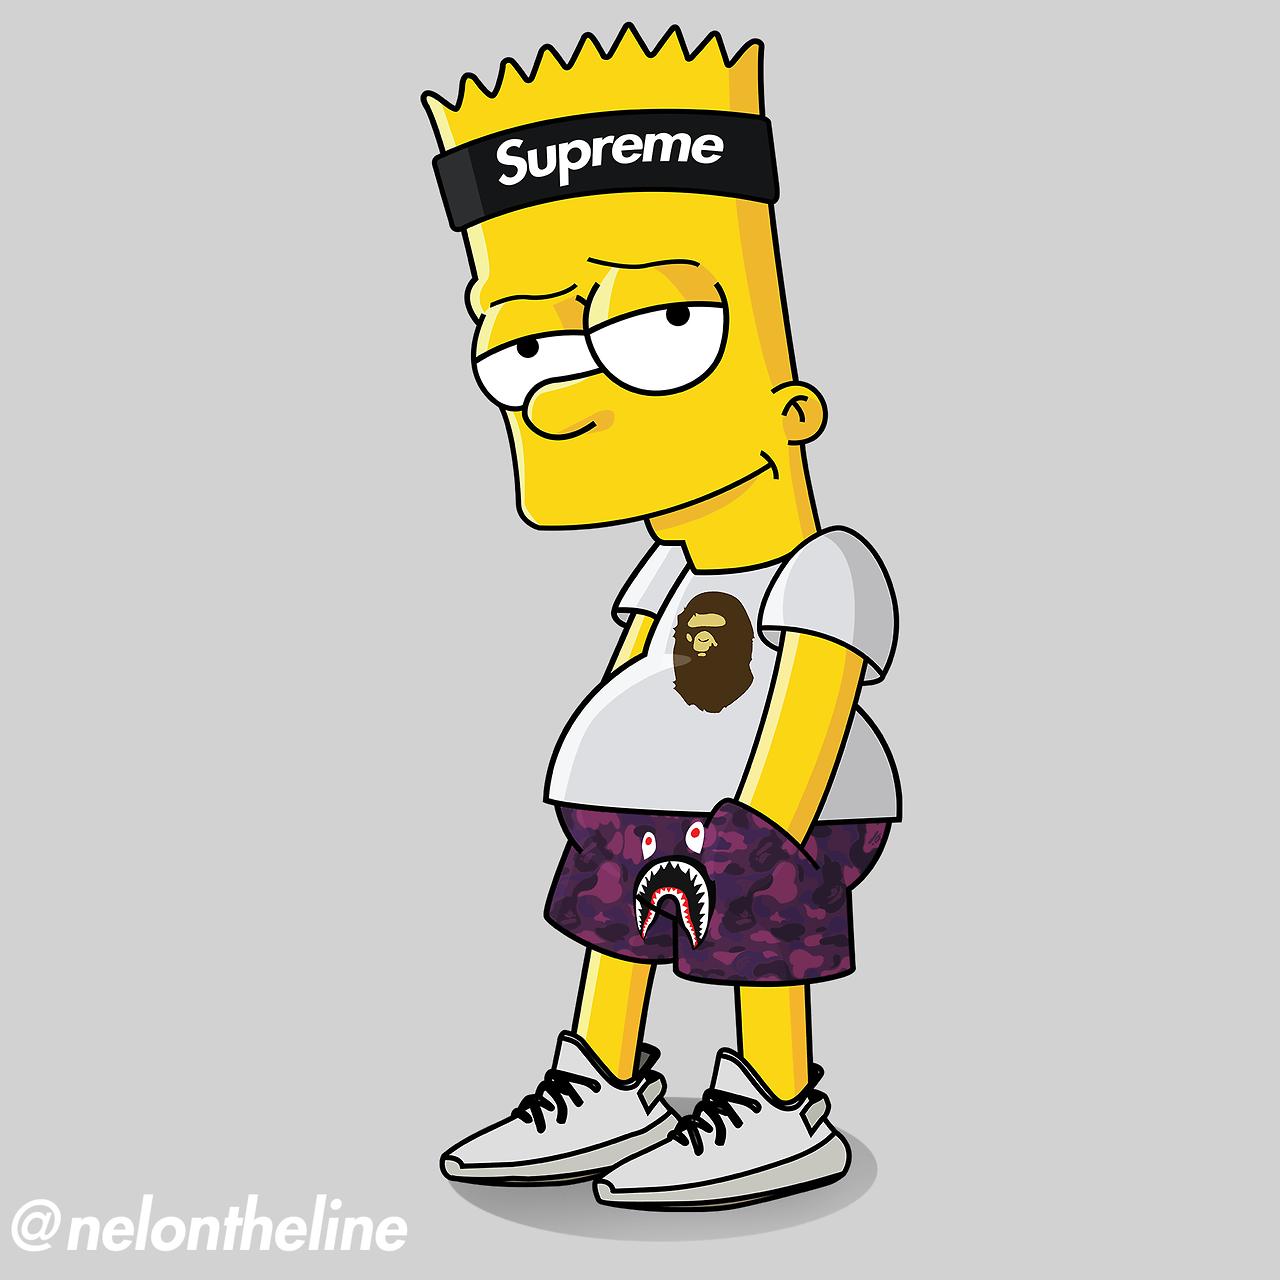 Bart Simpson Hypebeasted เดอะ ซิมป์สัน, ภาพประหลาด, วอ